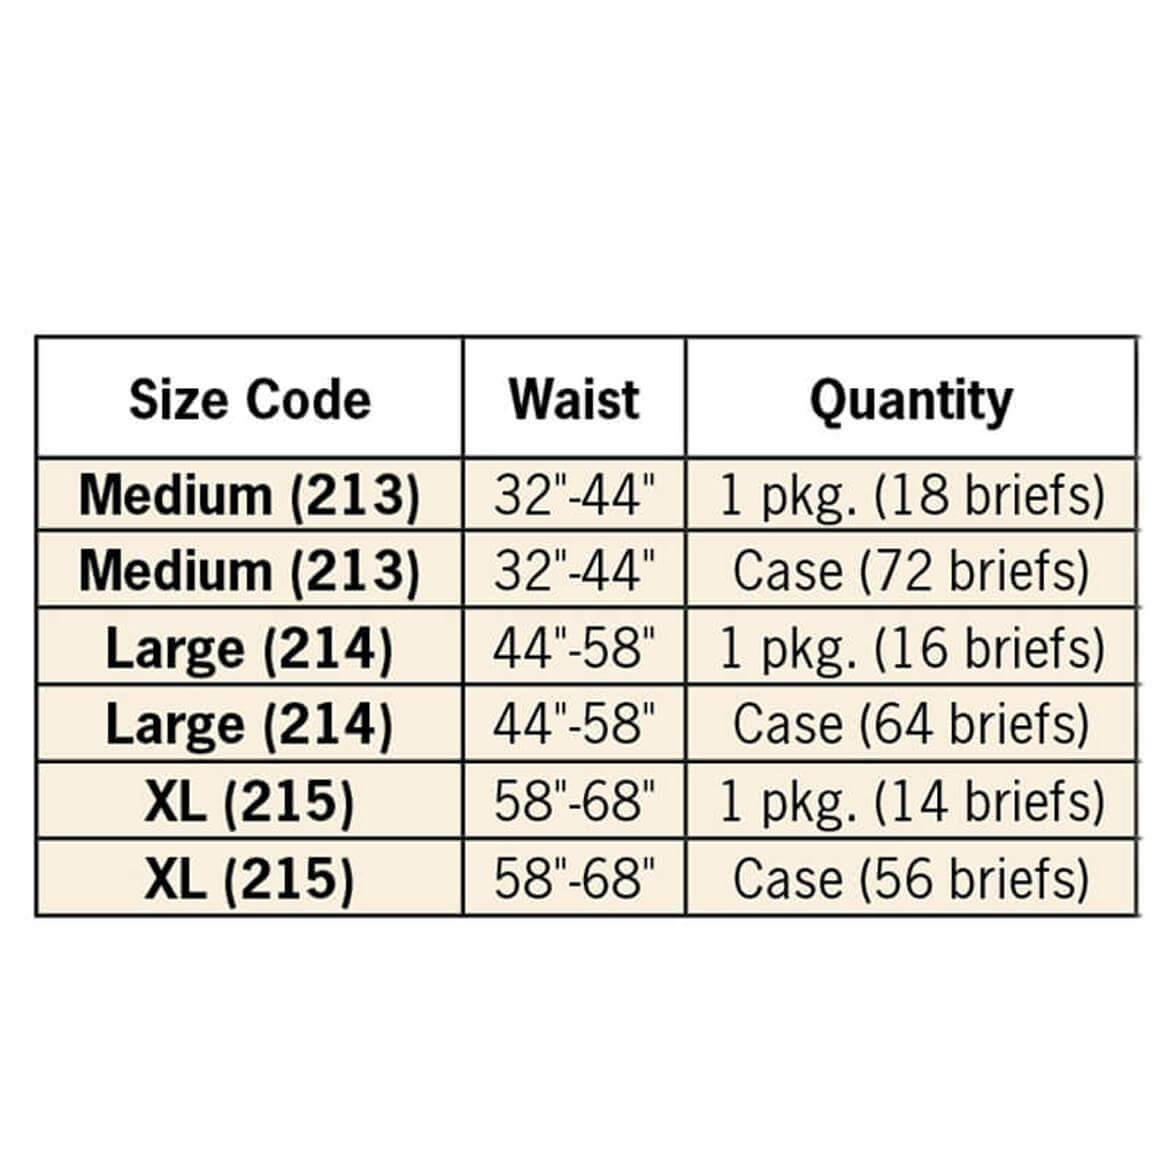 Female Protective Underwear, Case-355859